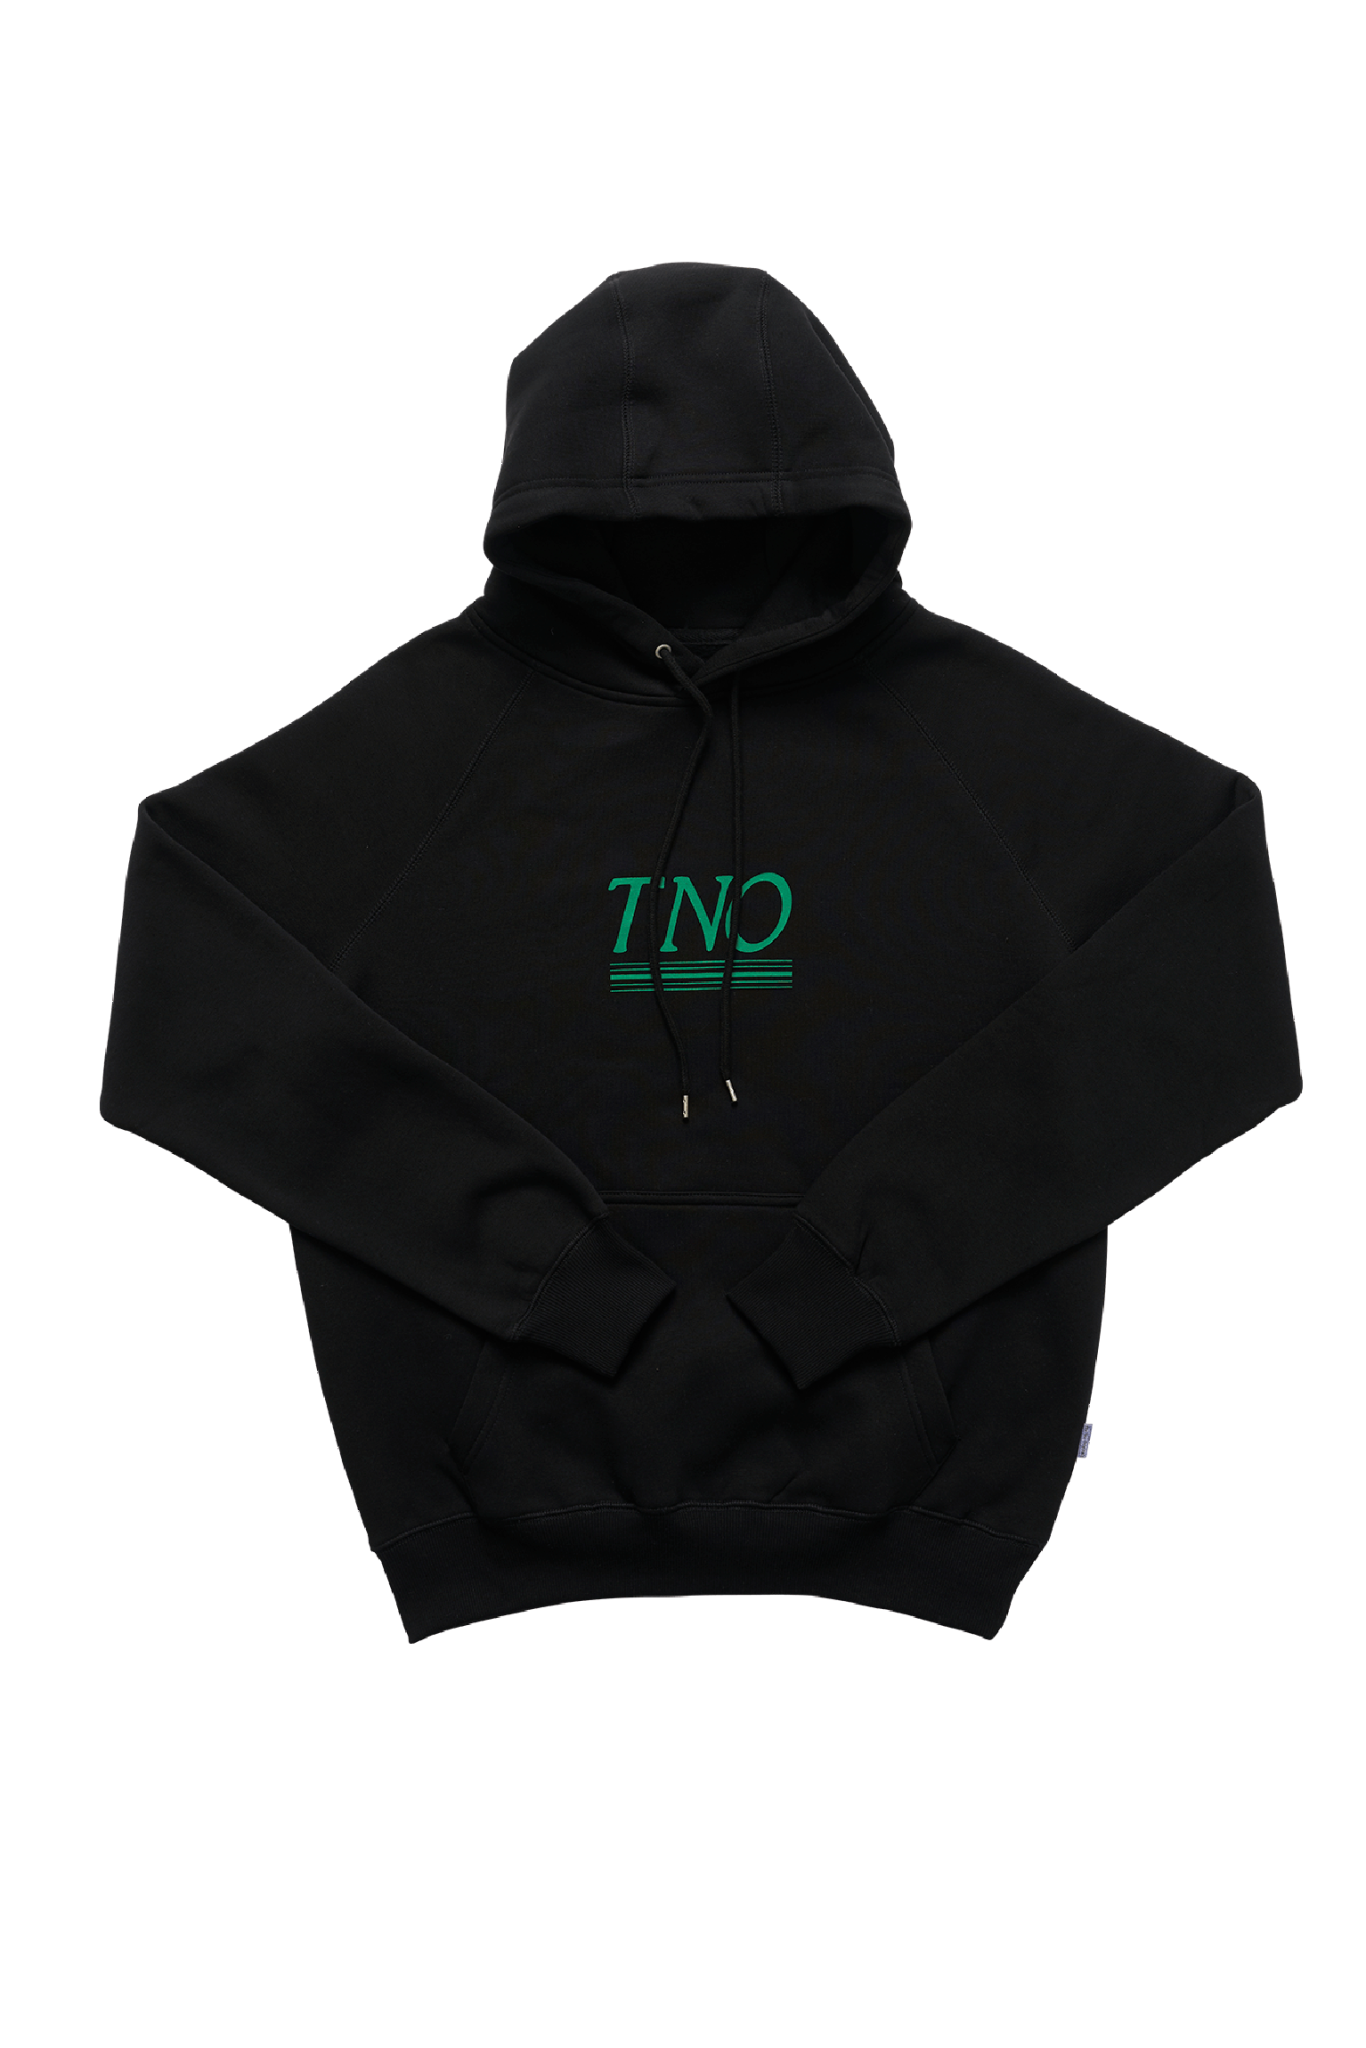 The New Originals Black/Green   TNO Underline Hoodie